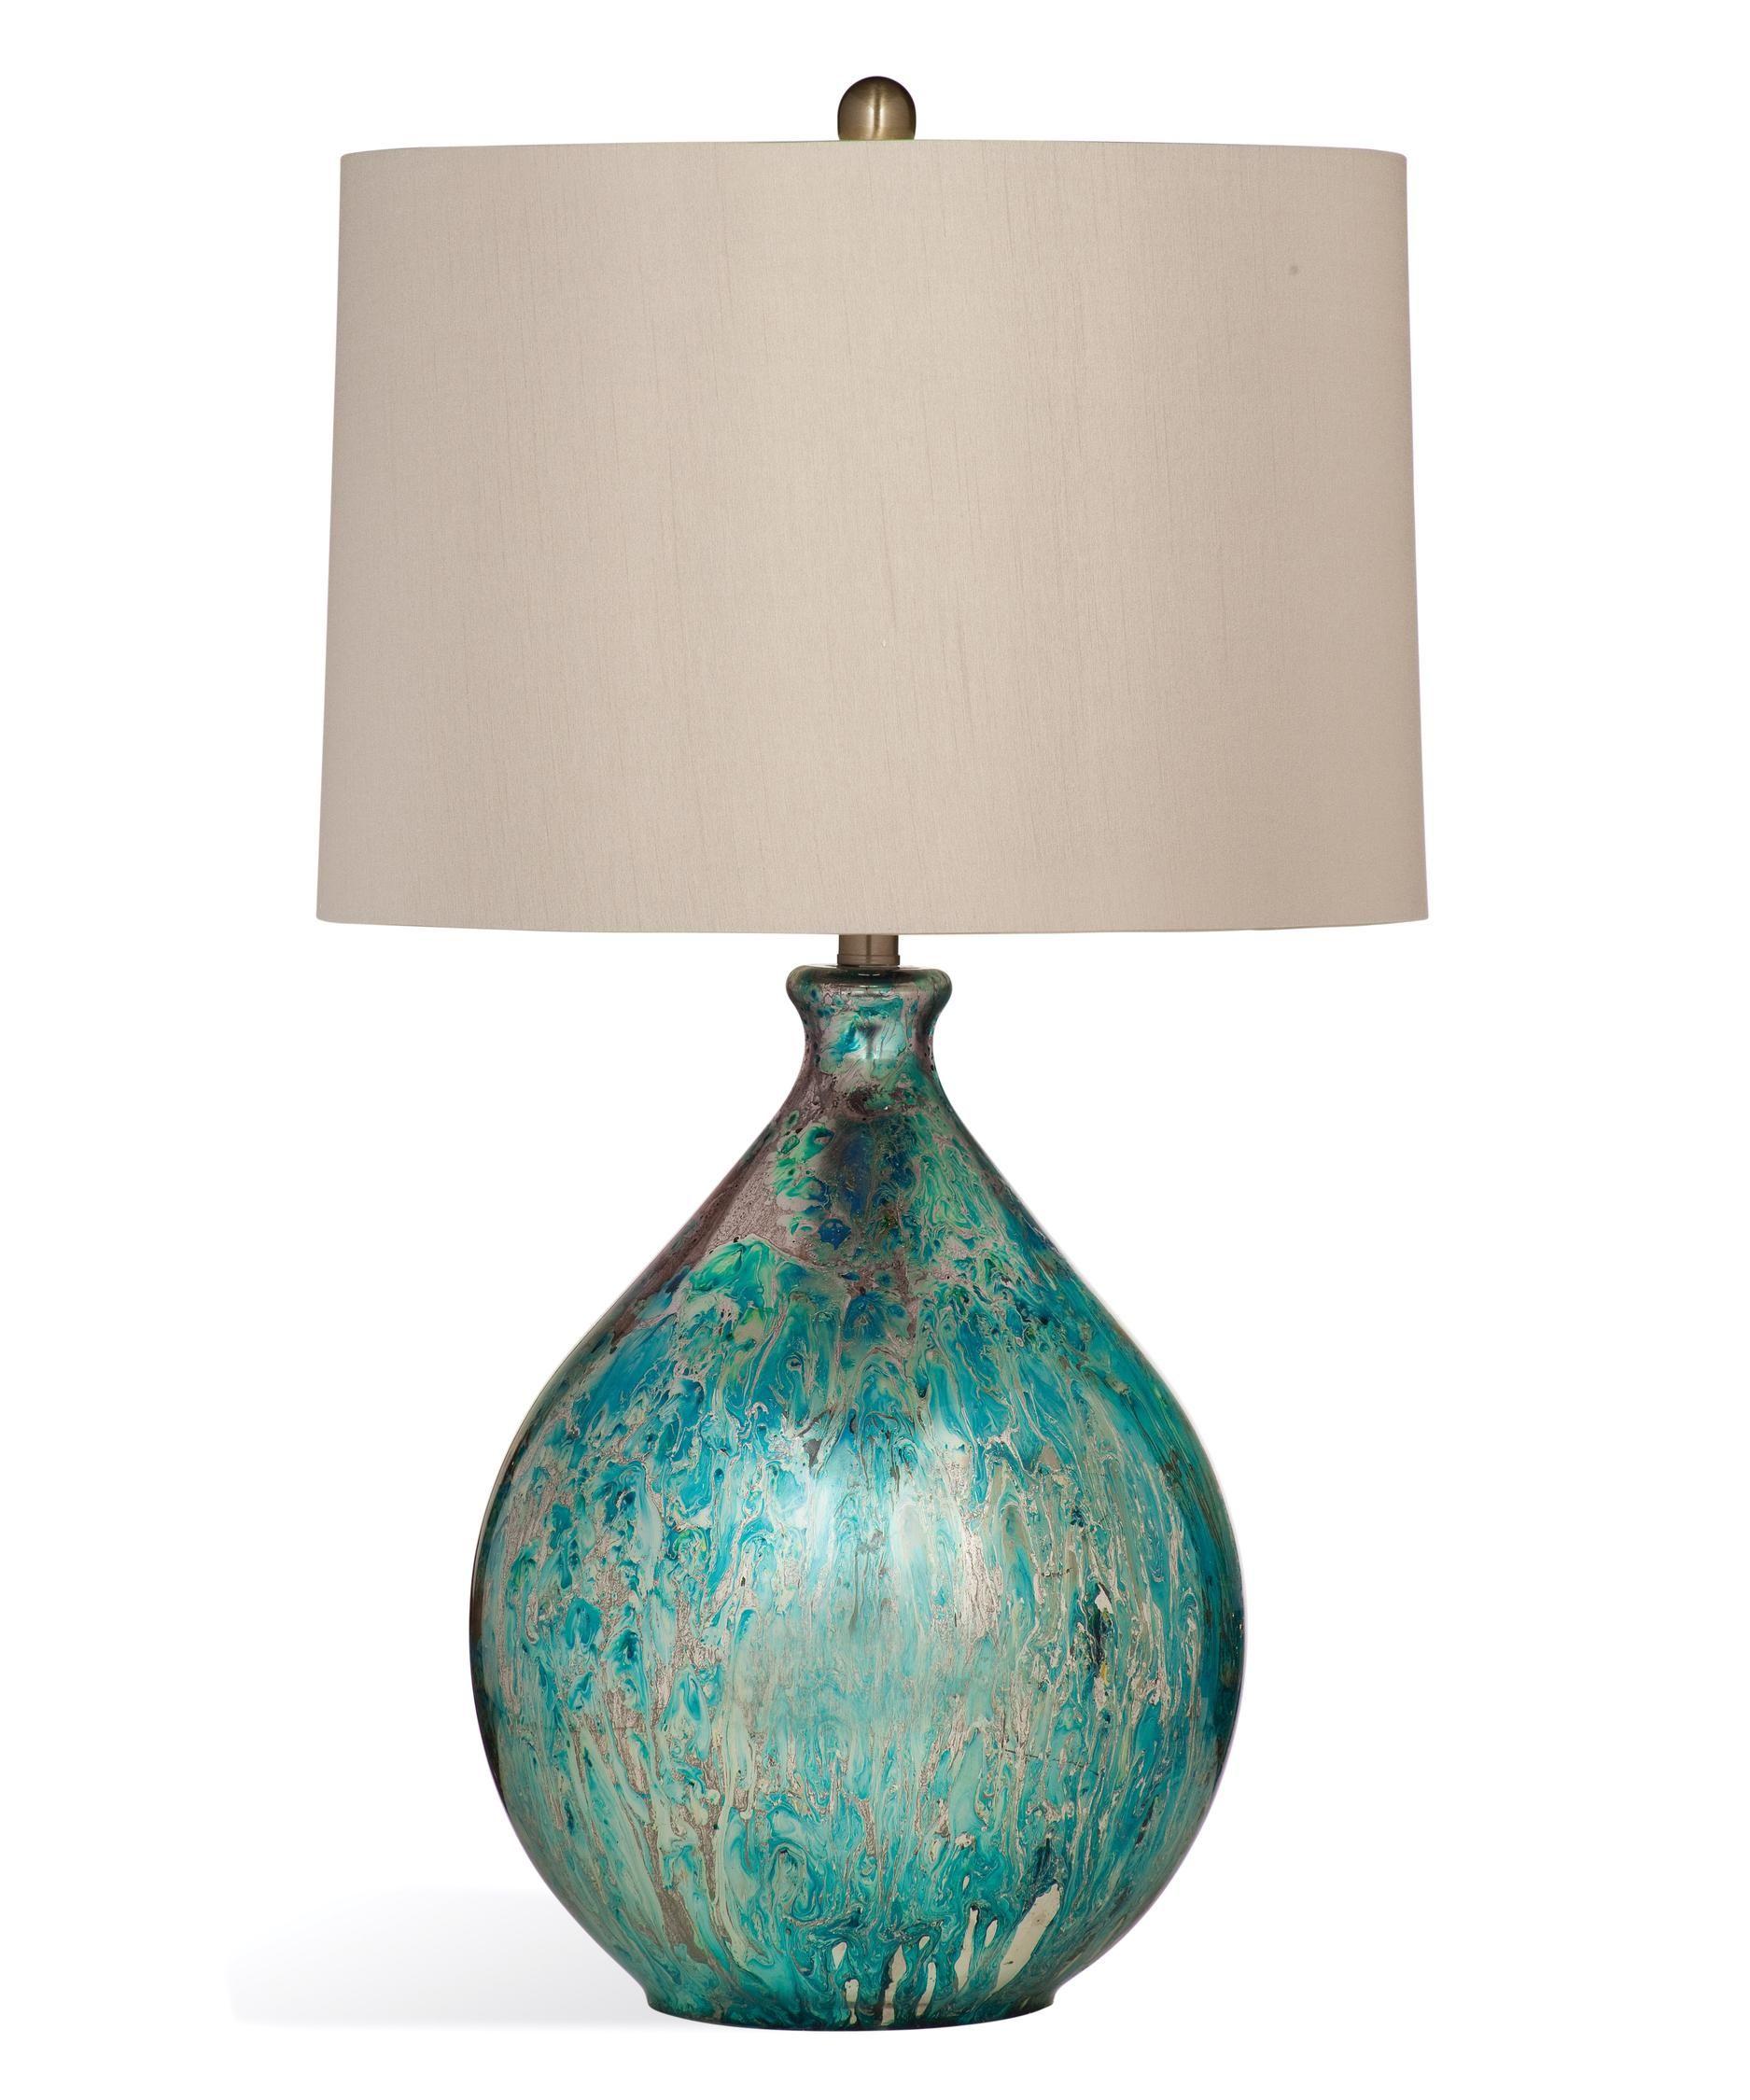 Bassett Mirror Company L3250tec Mira 31 Inch High Table Lamp Capitol Lighting 1 800lighting Com Table Lamp Lamp Mercury Glass Table Lamp